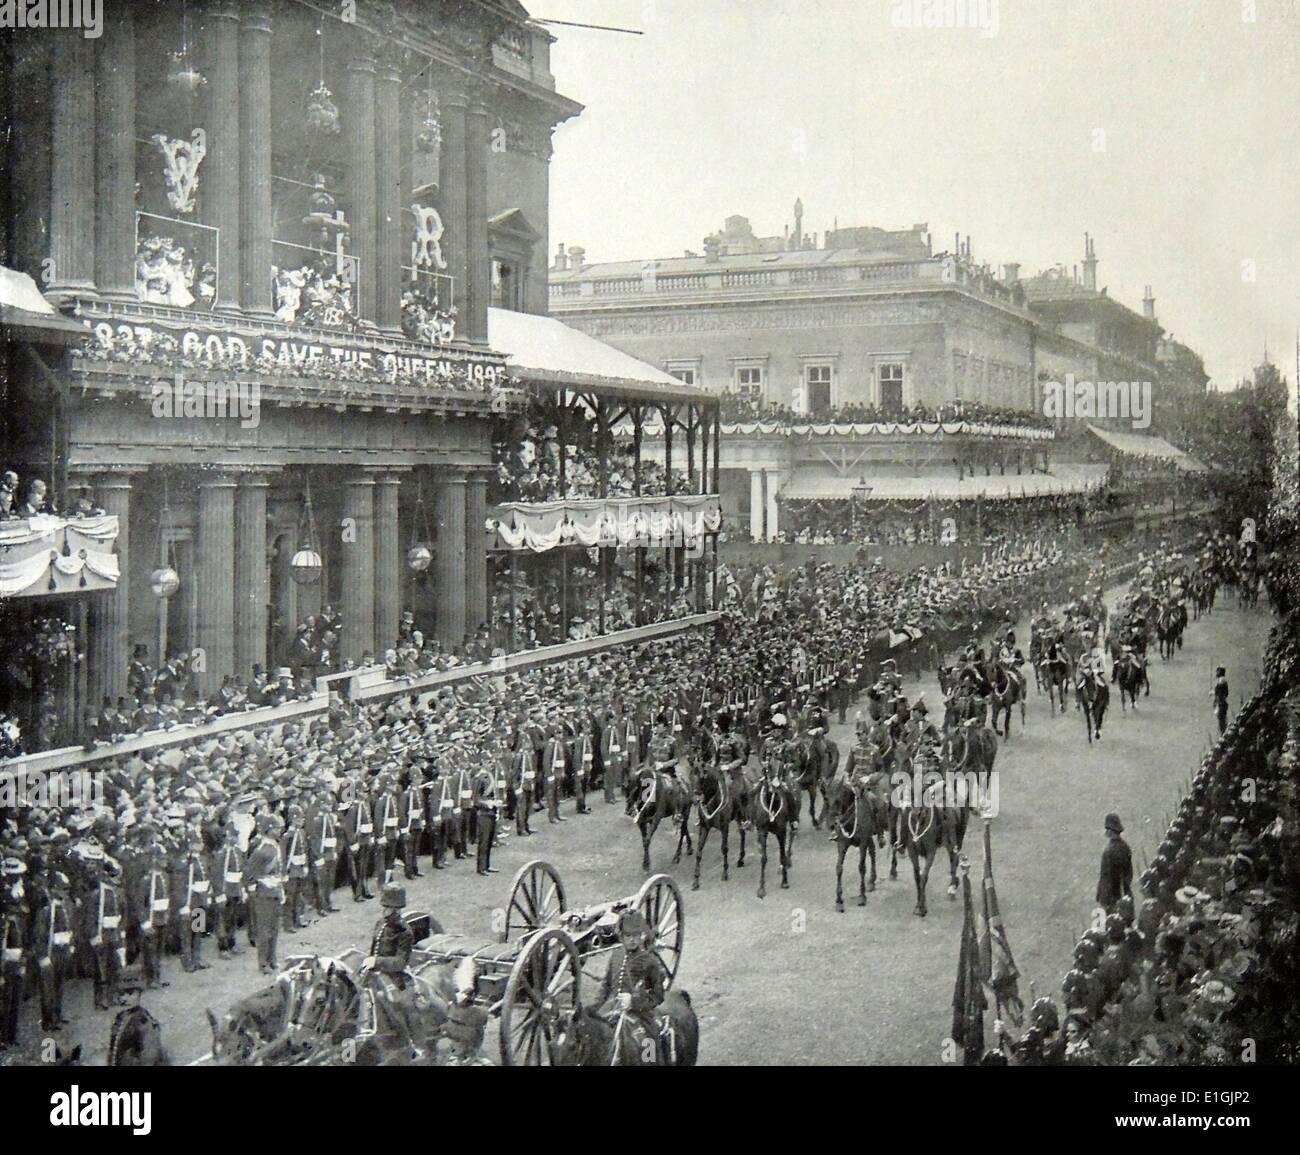 Diamond jubilee parade for Queen Victoria 1897 - Stock Image